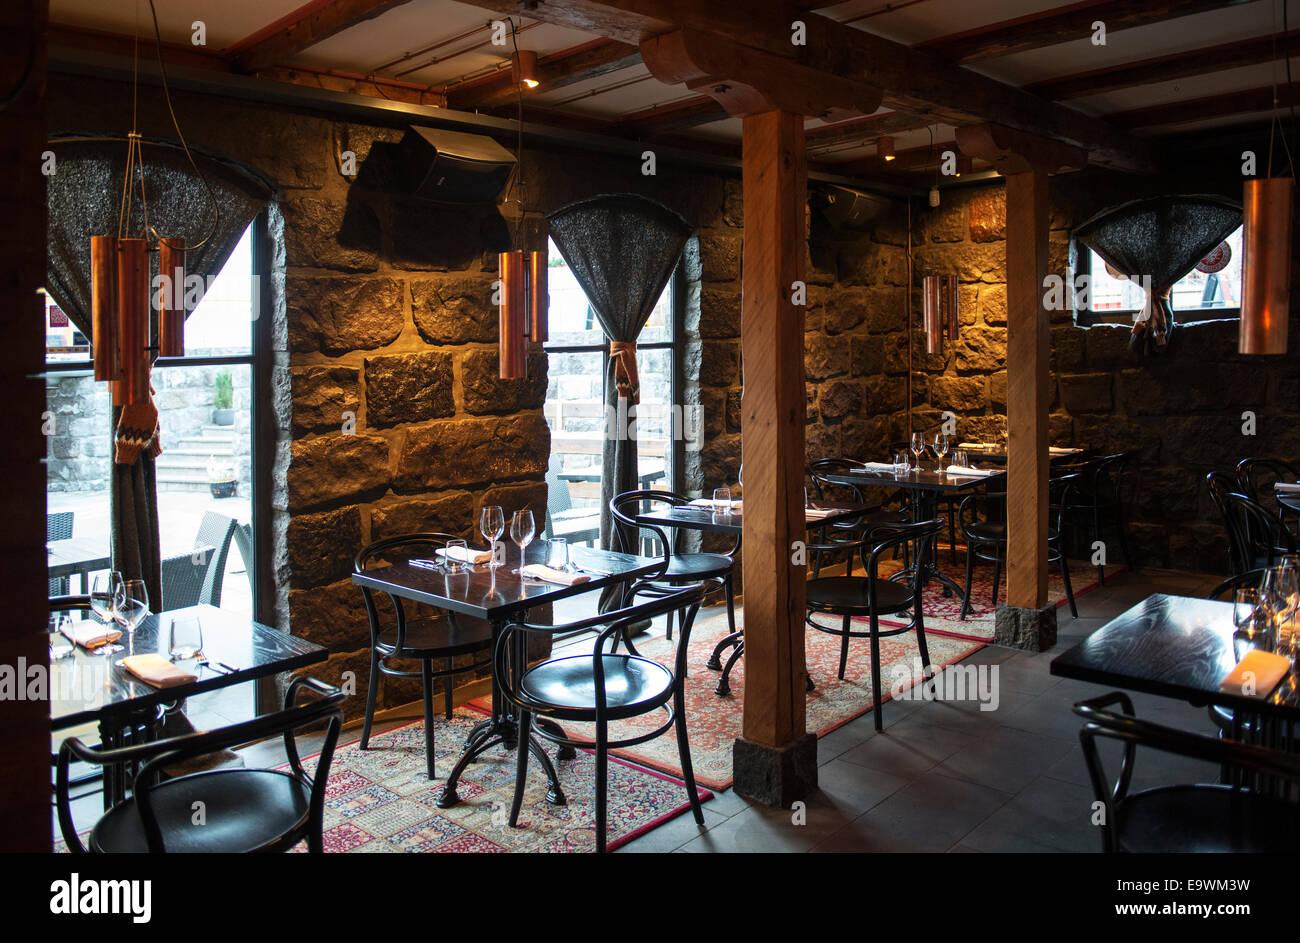 Mangia mi restaurant opens thursday 8 15 13 in downtown for Fish market reykjavik